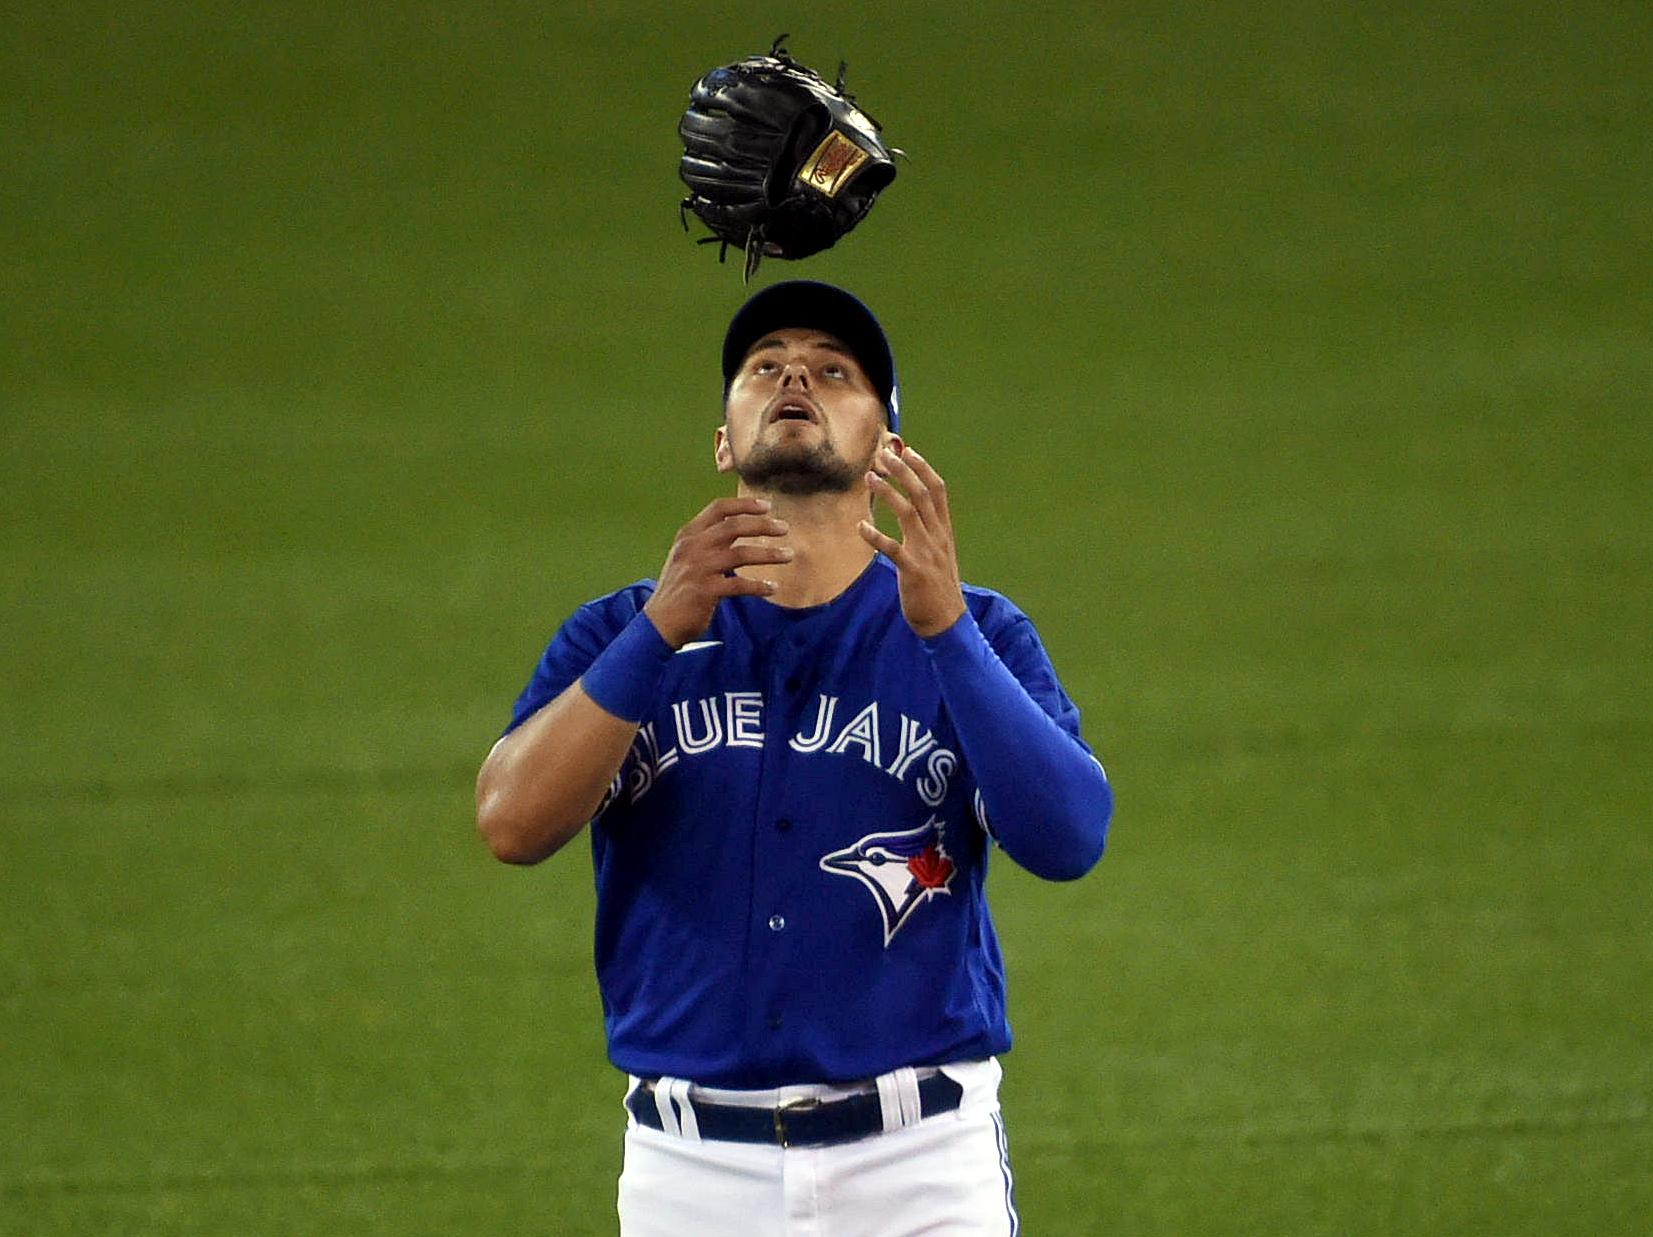 The Buffalo Blue Jays? Toronto team exploring possibility as MLB's shortened season nears